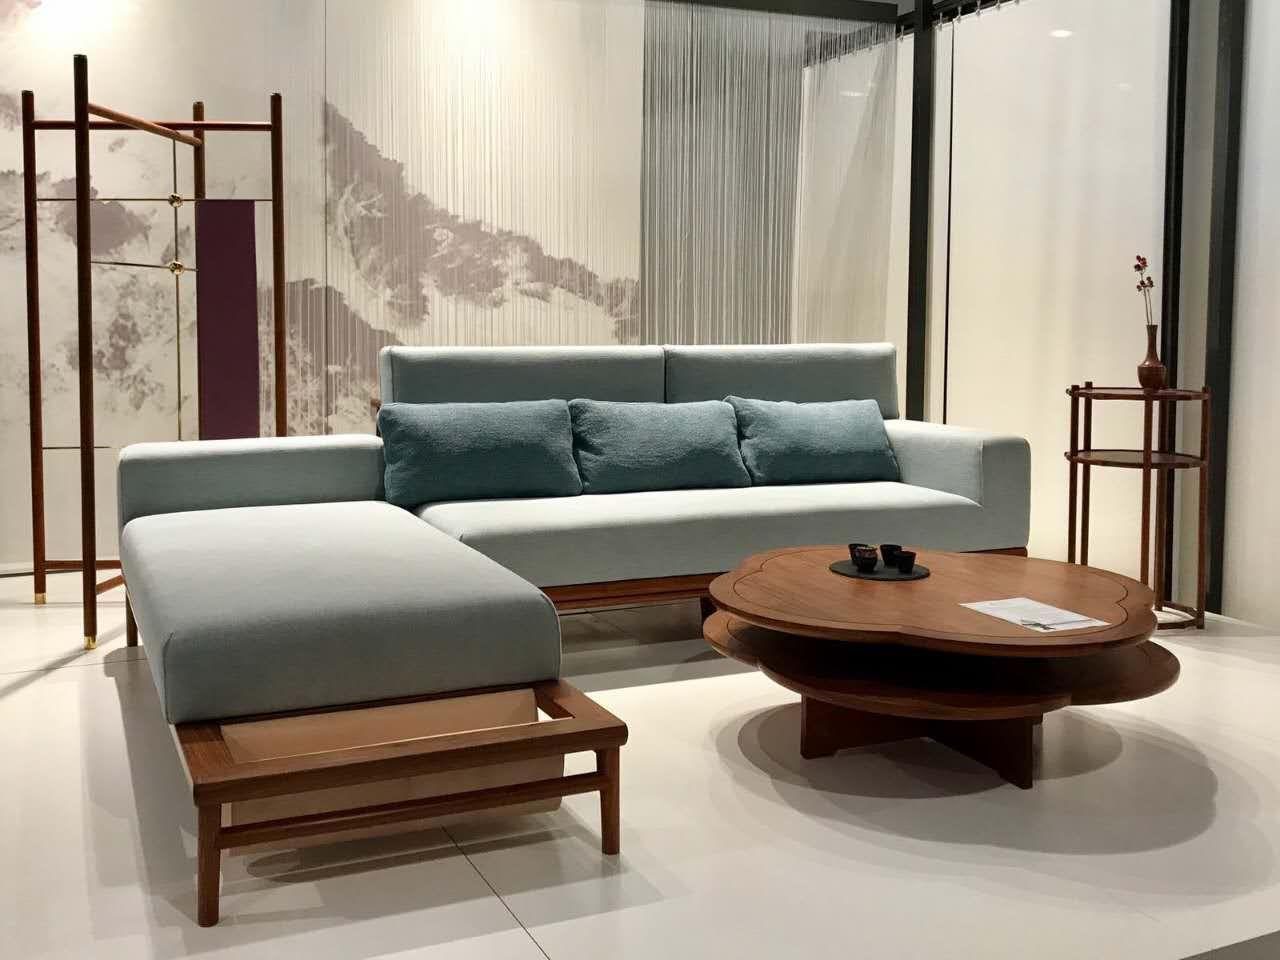 Soft N Soothing Sofa Design In 2021 Modern Sofa Designs Chinese Furniture Design Furniture Design Modern